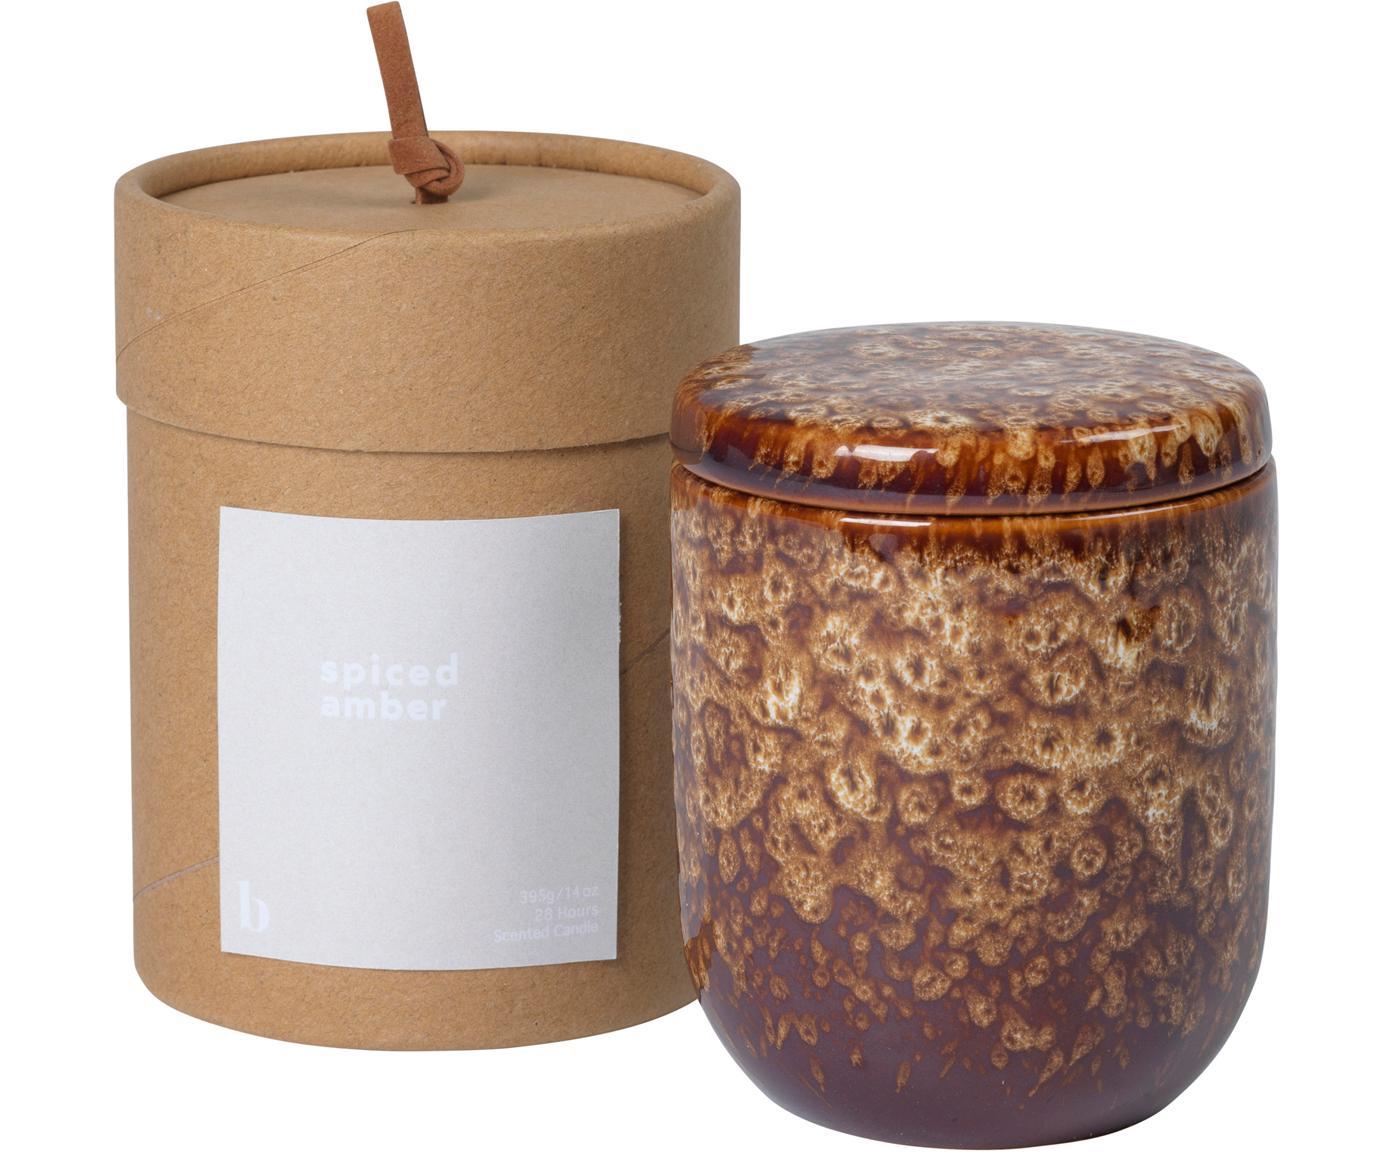 Candela profumata Spiced Amber, Contenitore: ceramica, Tonalità marrone, Ø 8 x Alt. 9 cm